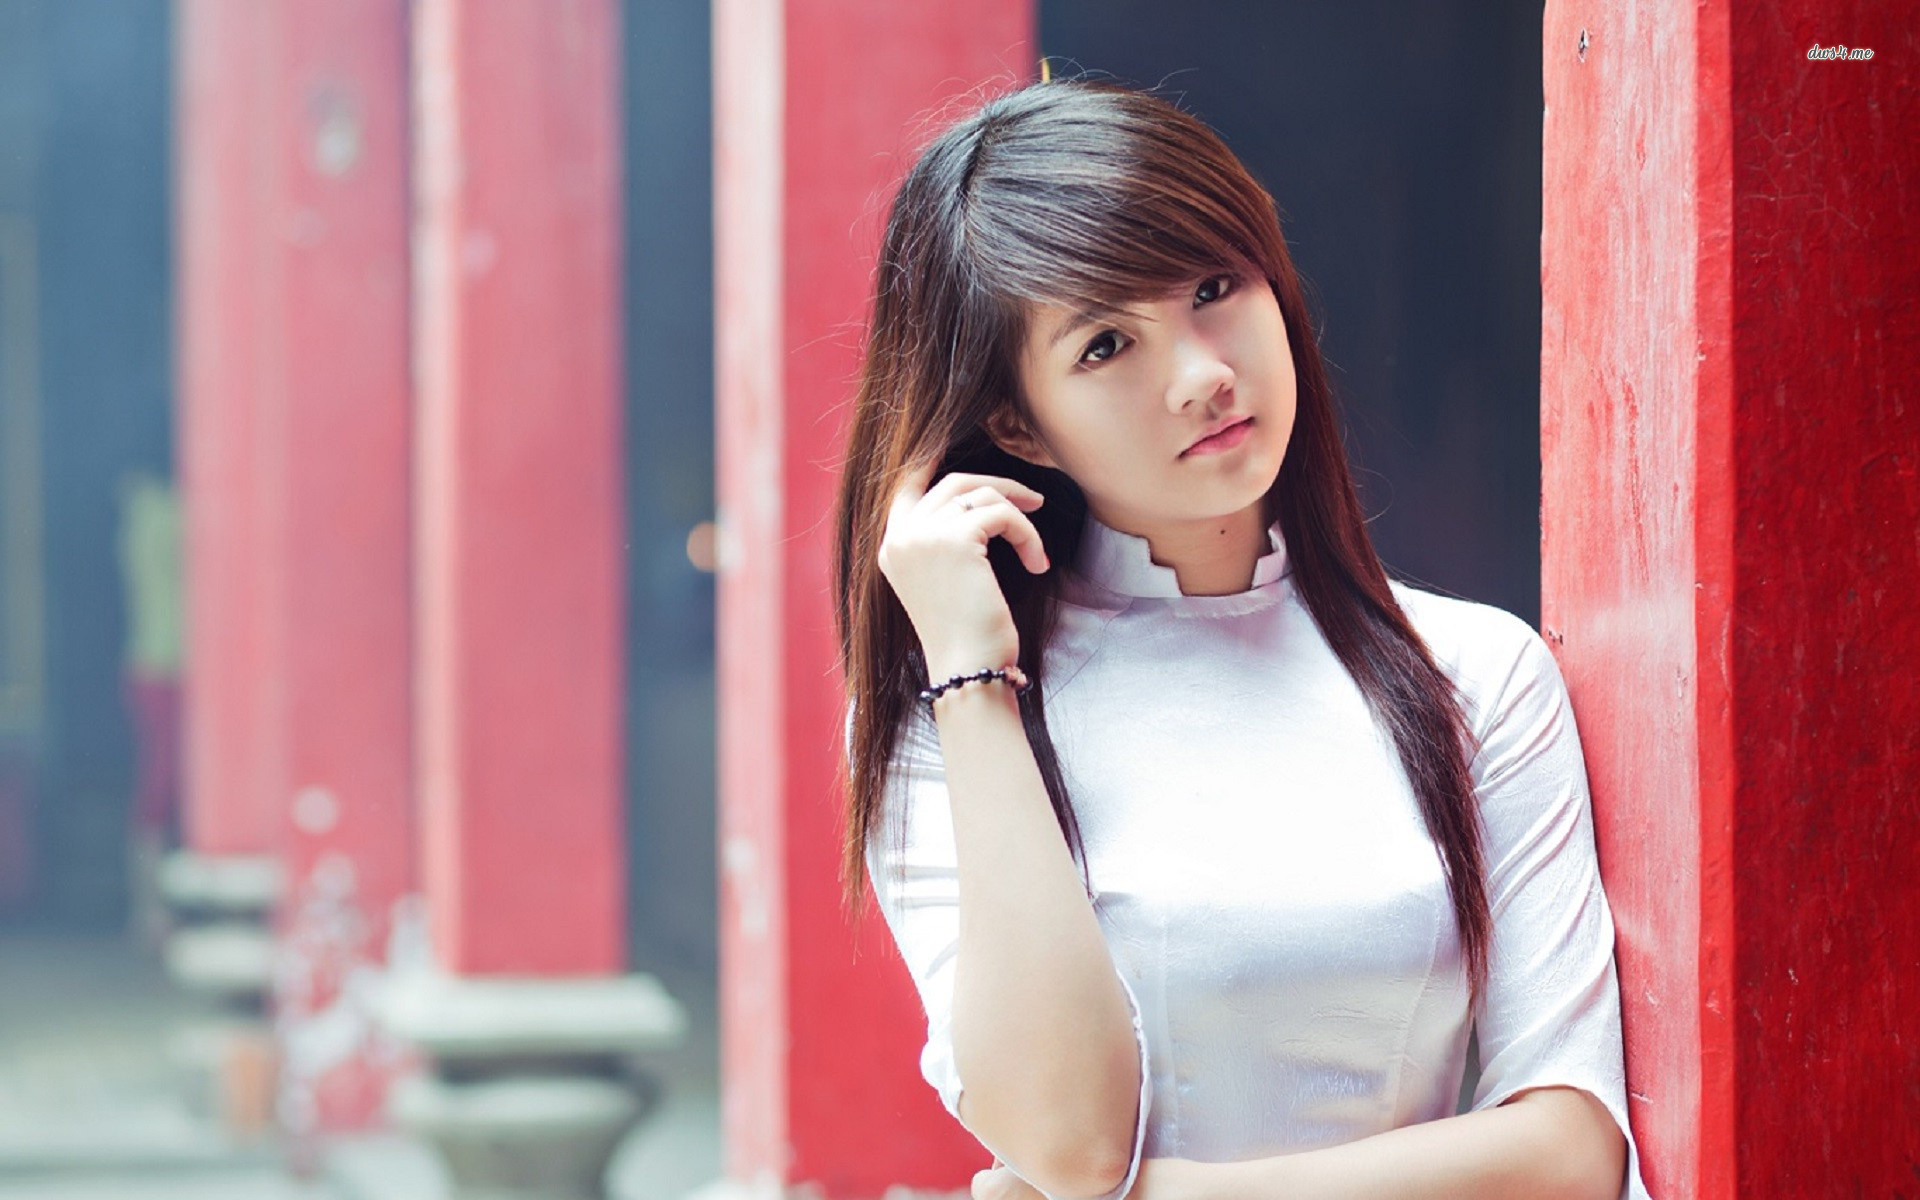 Trinnie Xiu